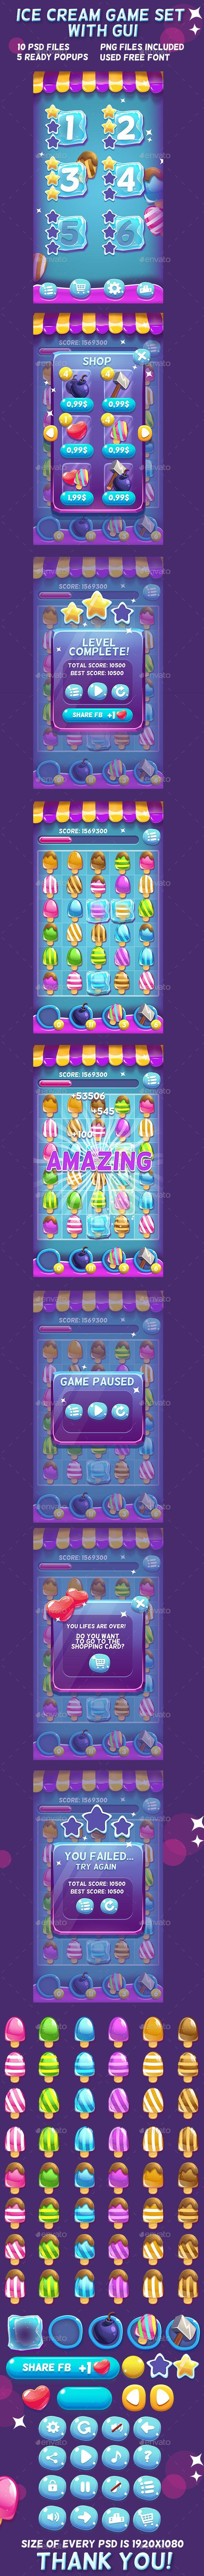 Ice Cream Game Set with UI (Game Kits)